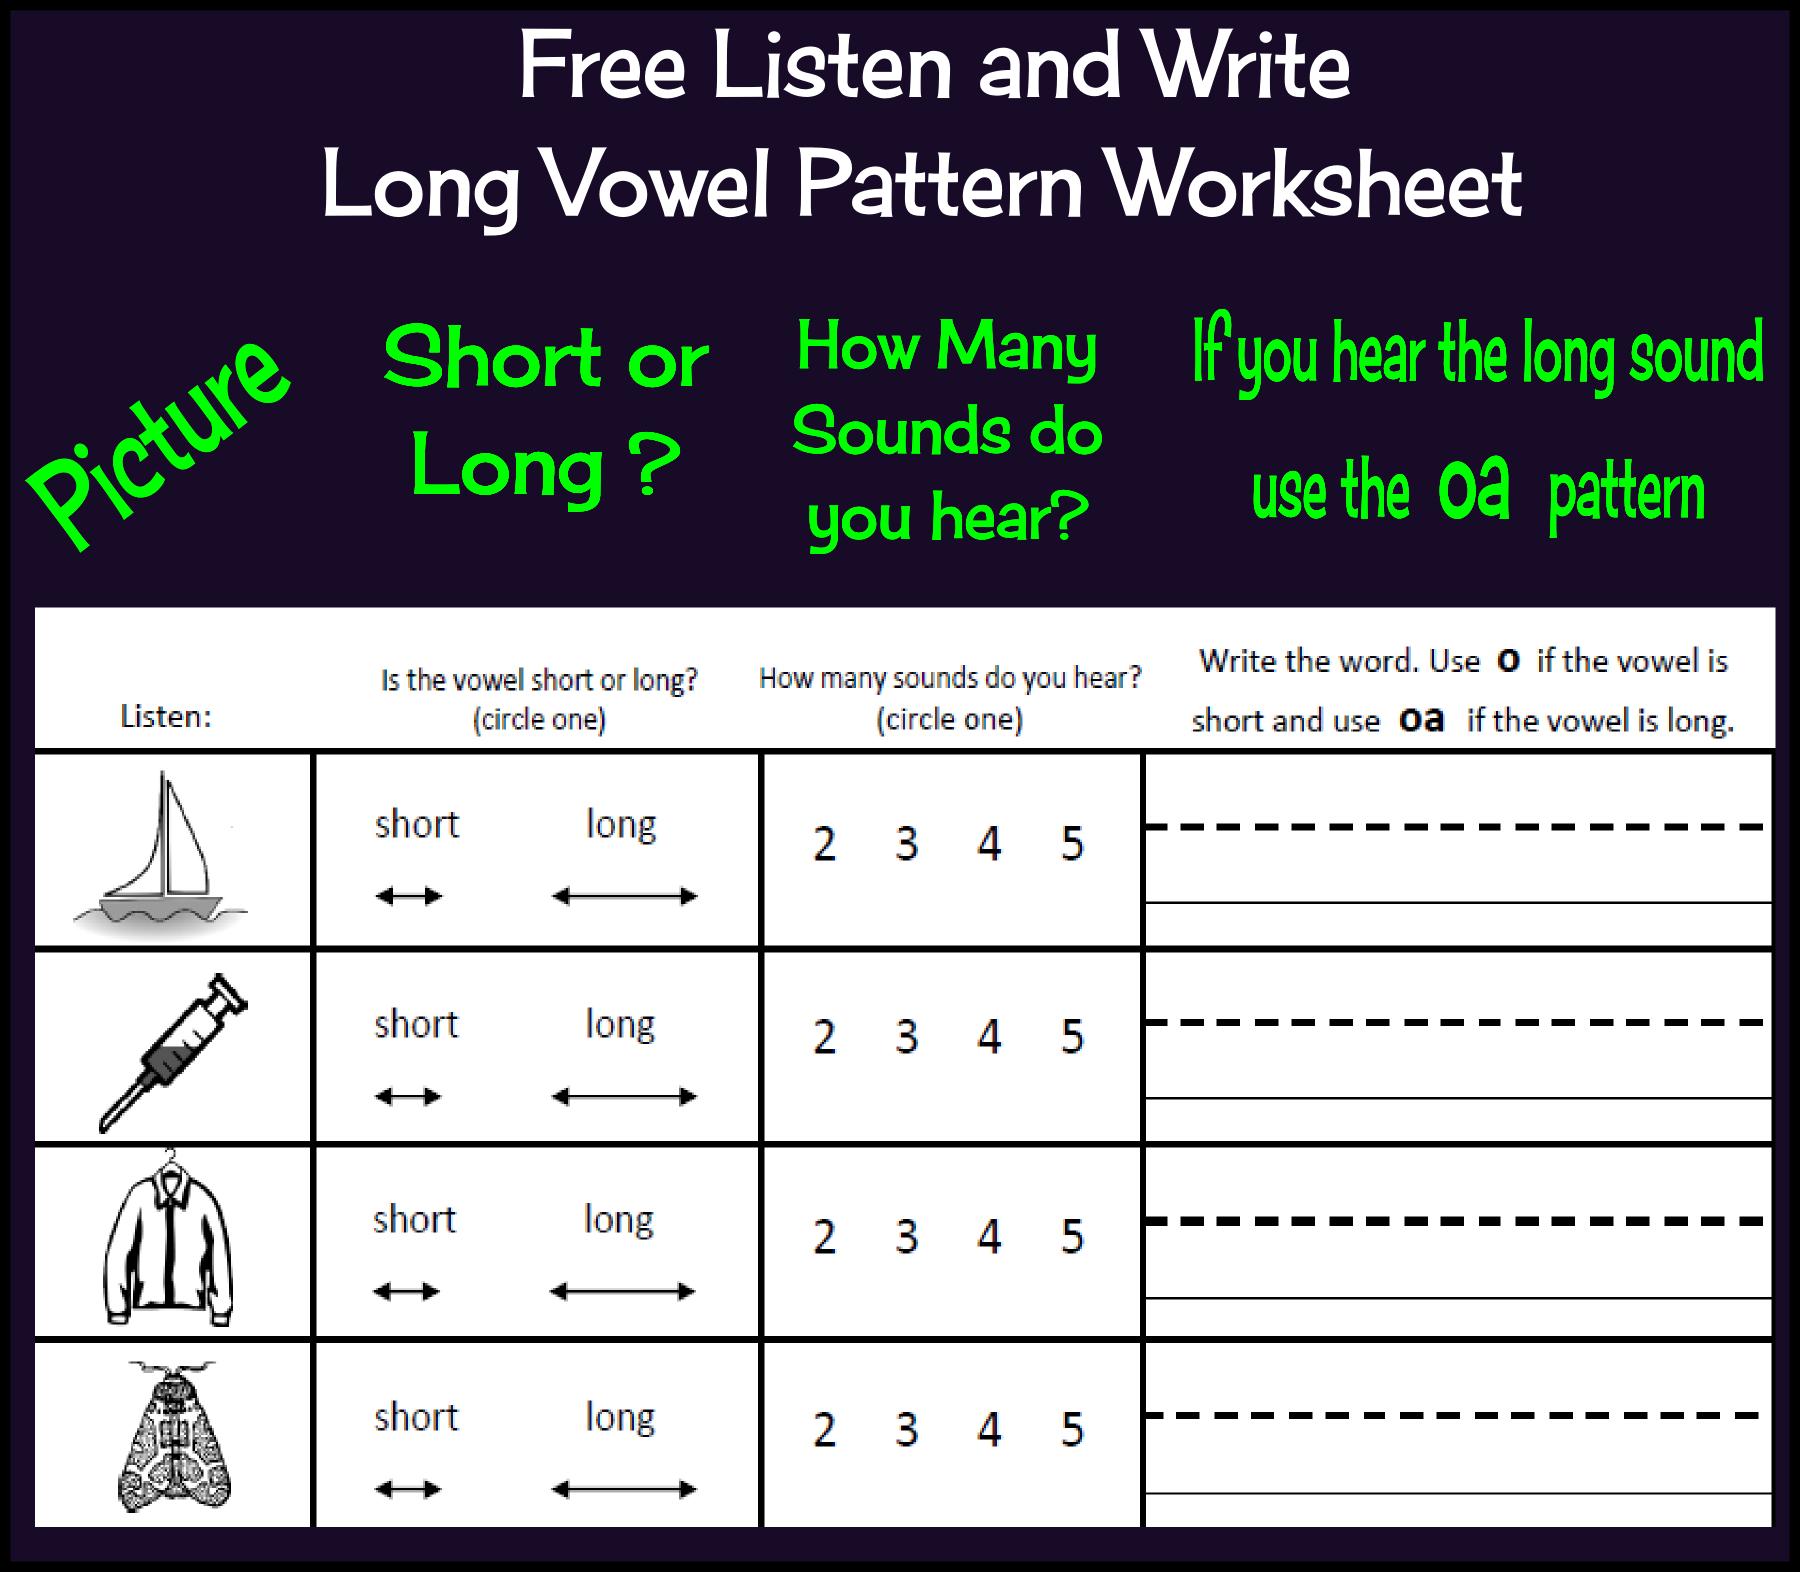 Free Listen And Write Long Vowel Patterns Long O Worksheet Slp